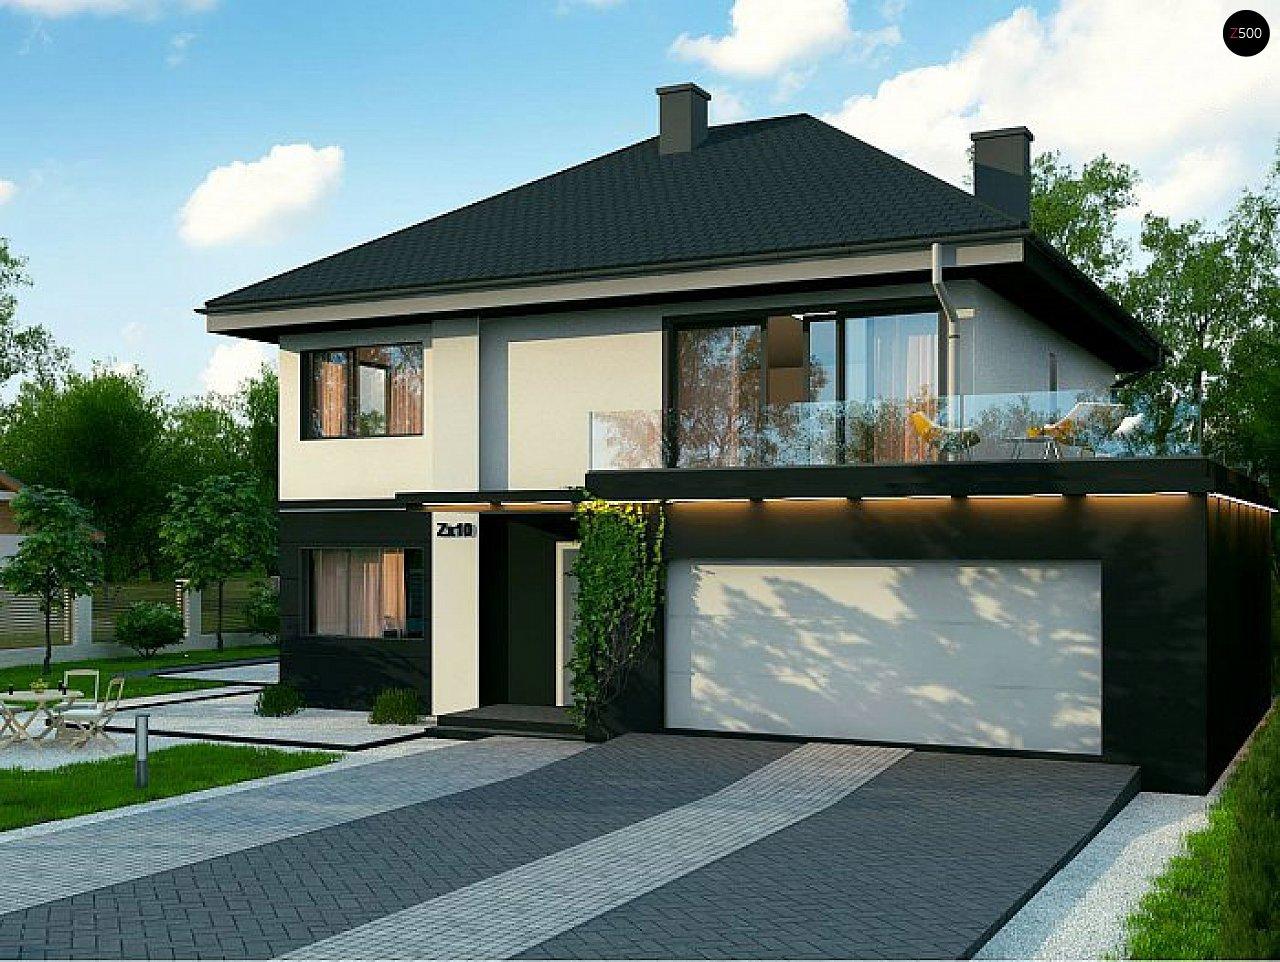 Проект дома Zx10 F - 1